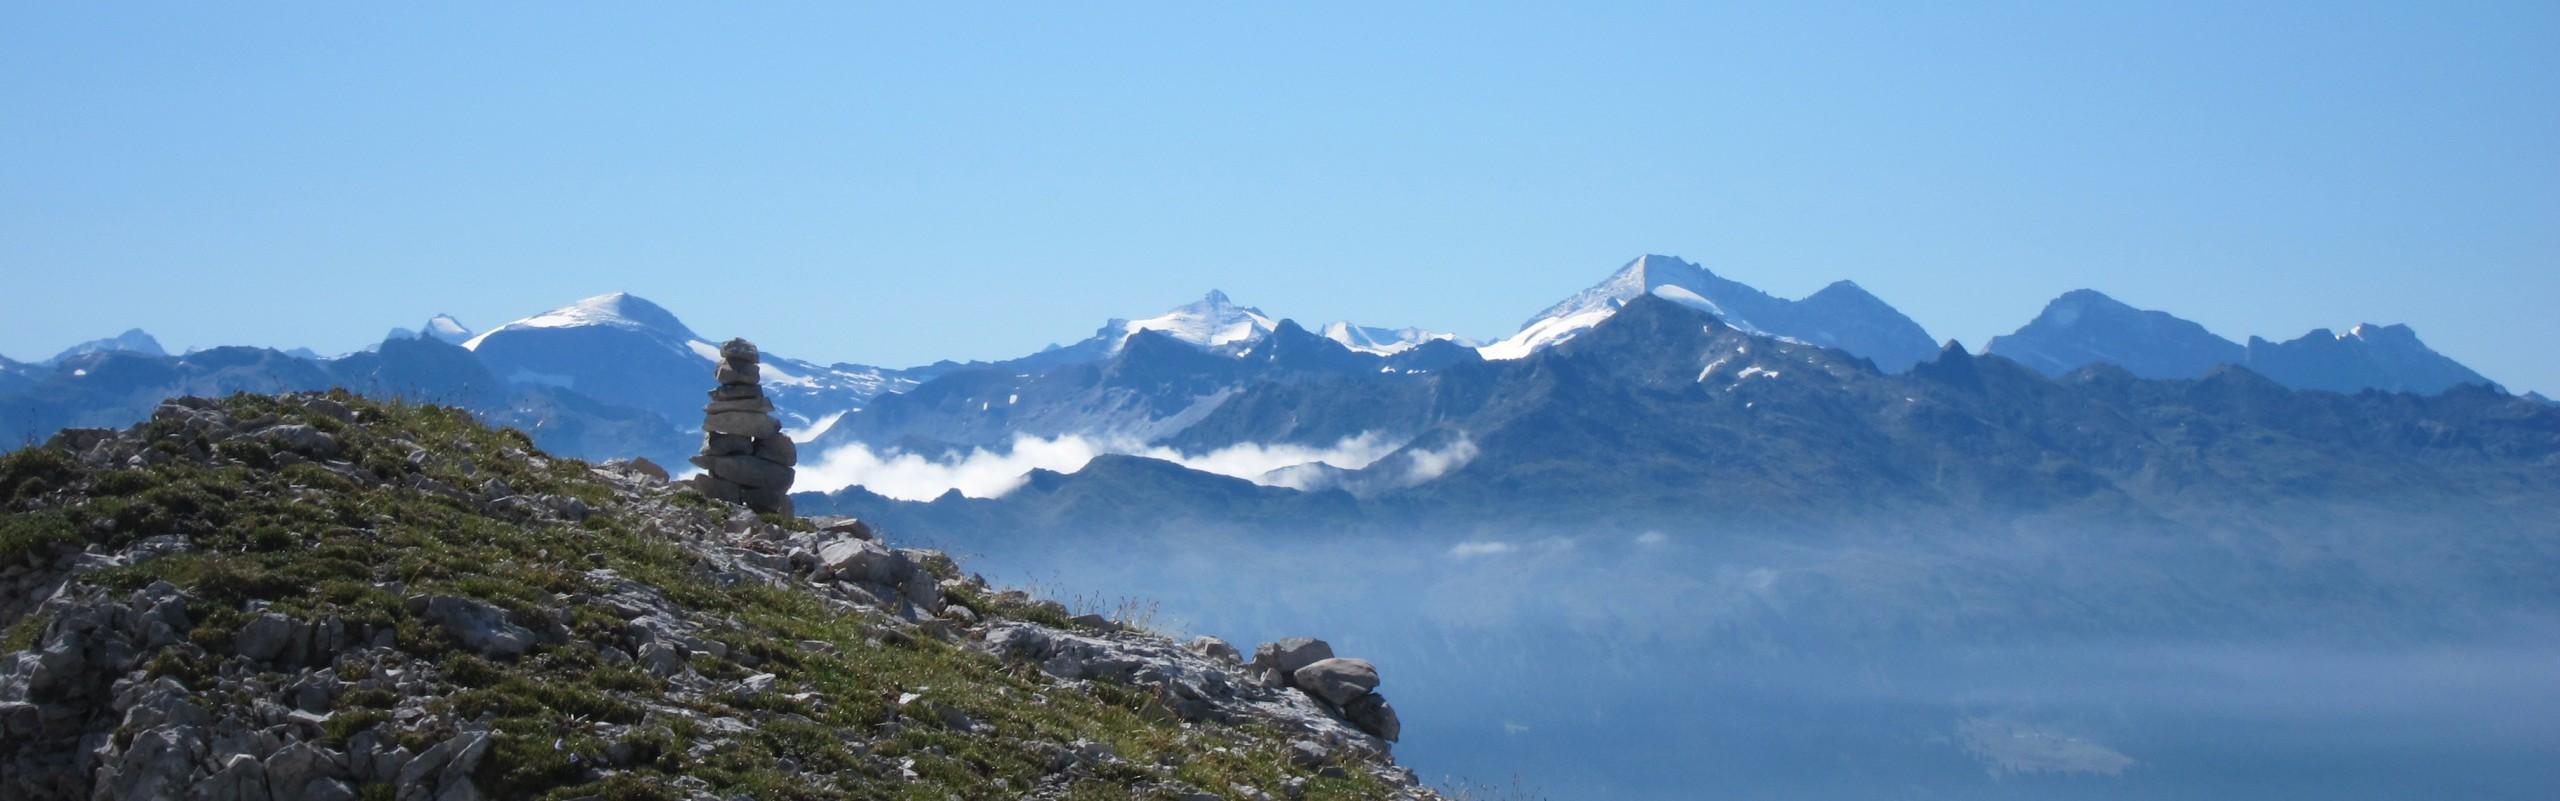 Alpiner Klub Karwendler Innsbruck